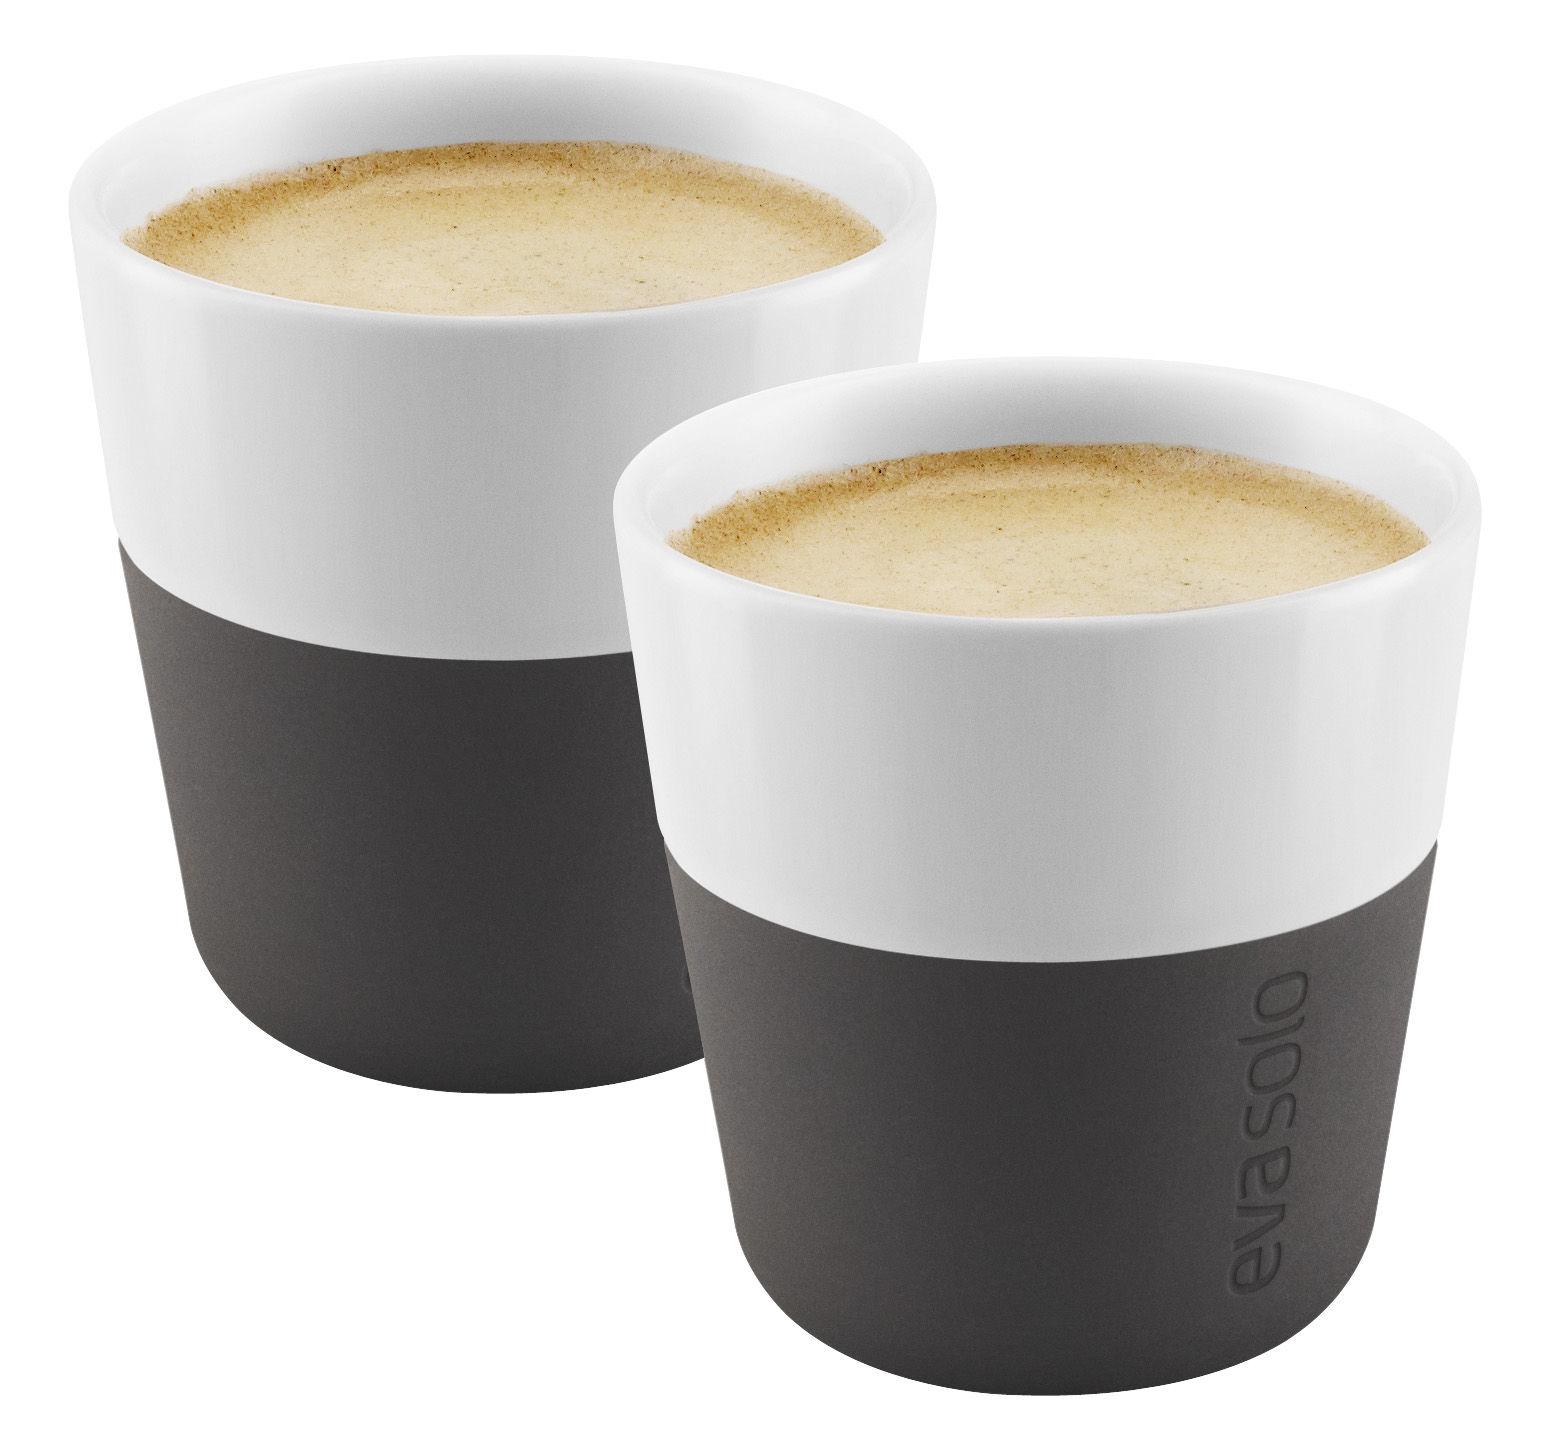 Tableware - Coffee Mugs & Tea Cups - Espresso cup - Set of 2 - 80 ml by Eva Solo - White / Carbon black silicone - China, Silicone